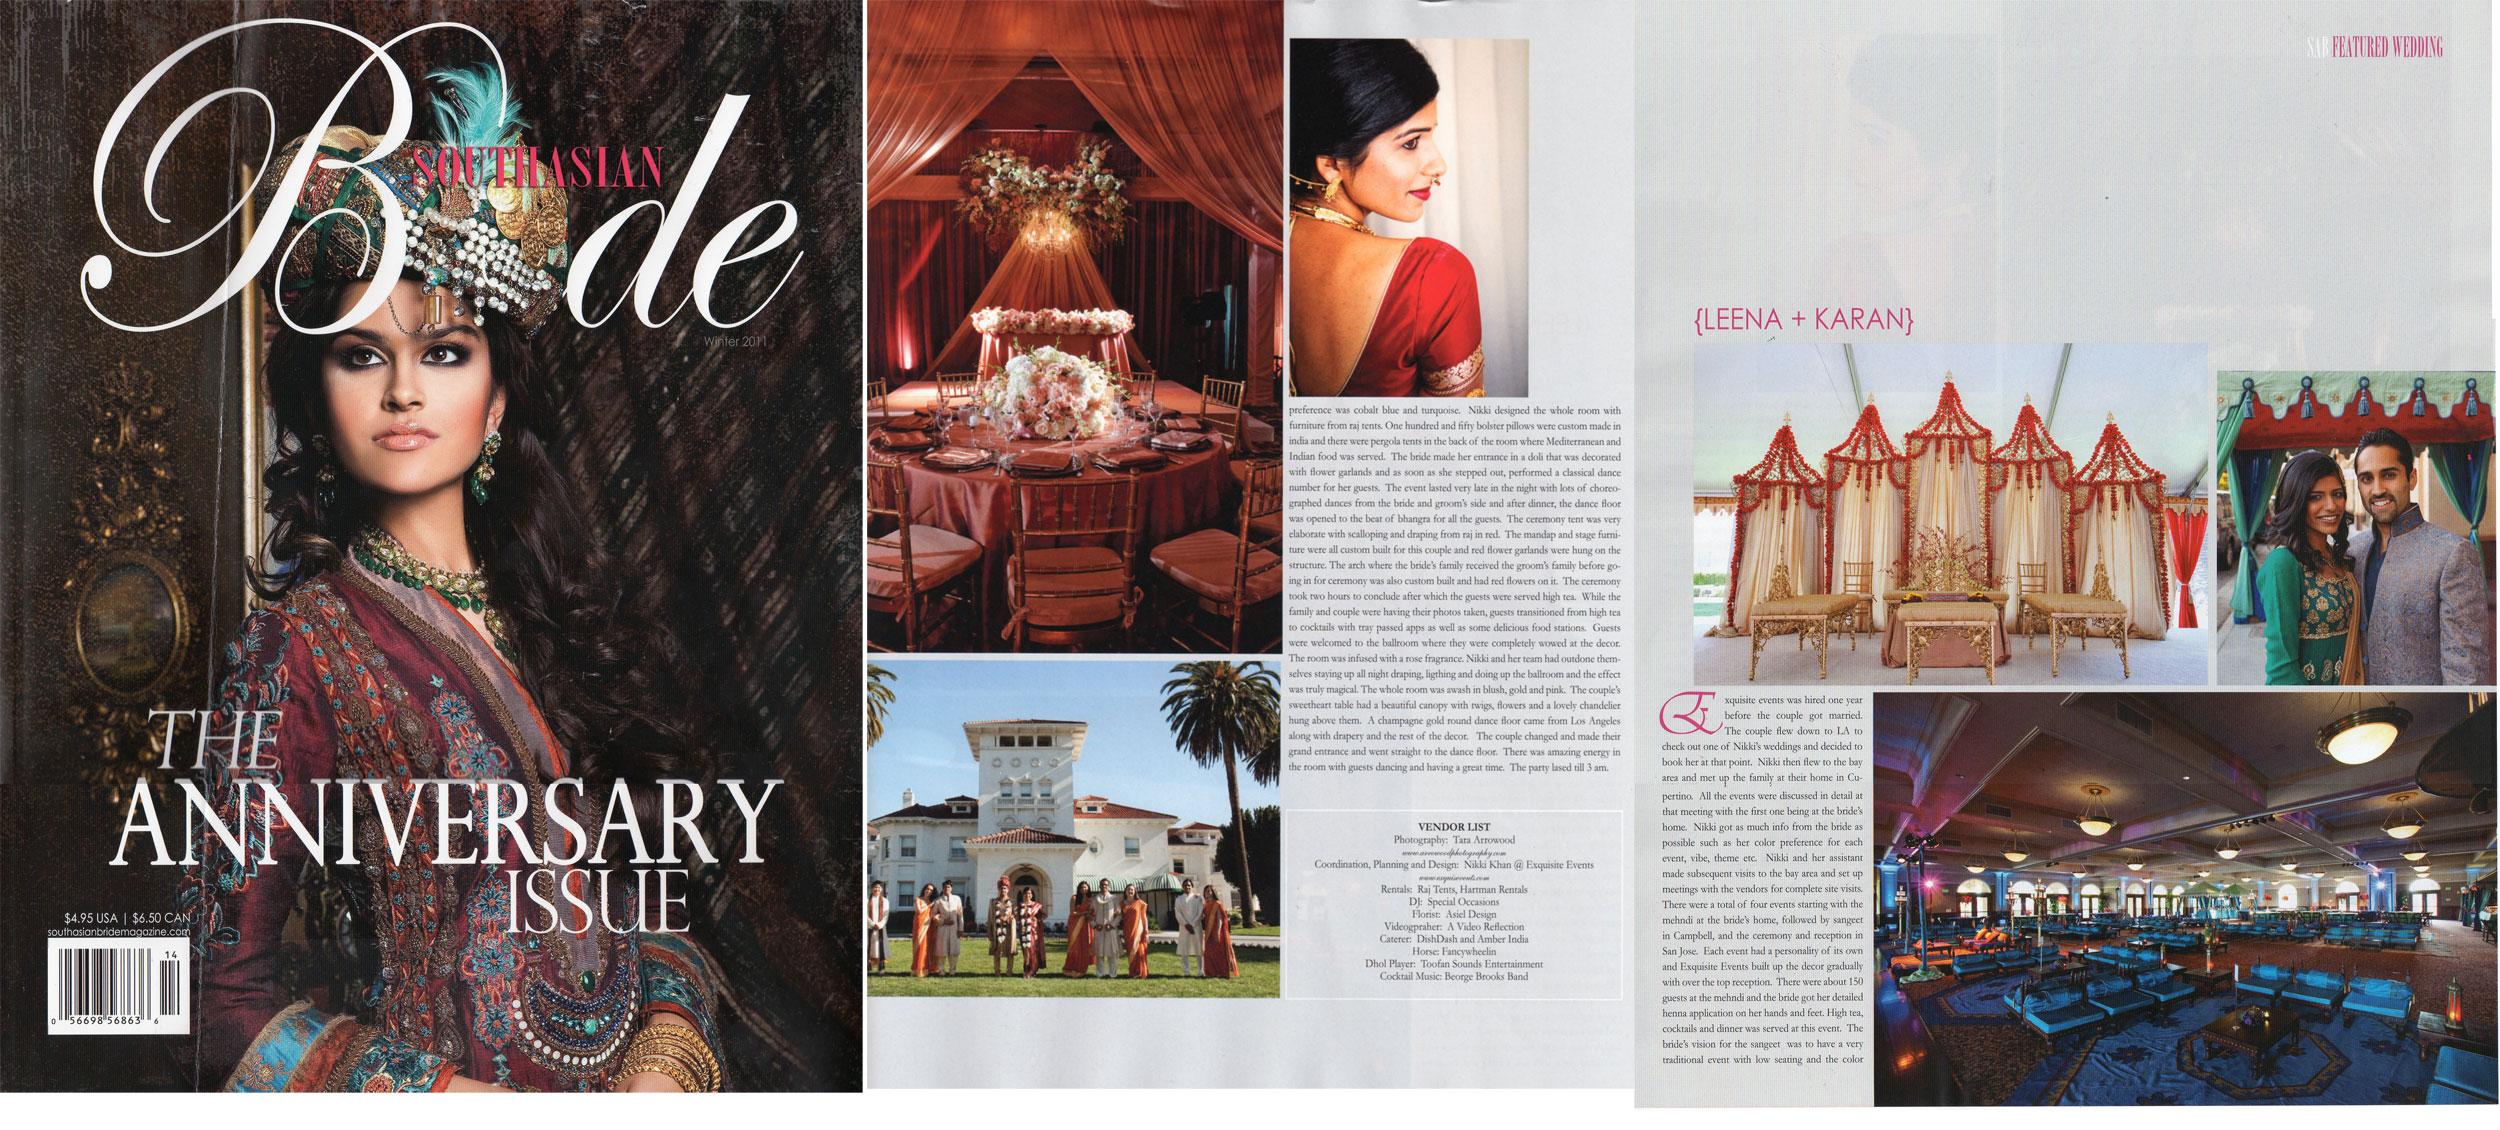 raj-tents-south-asian-bride-winter-2011.jpg